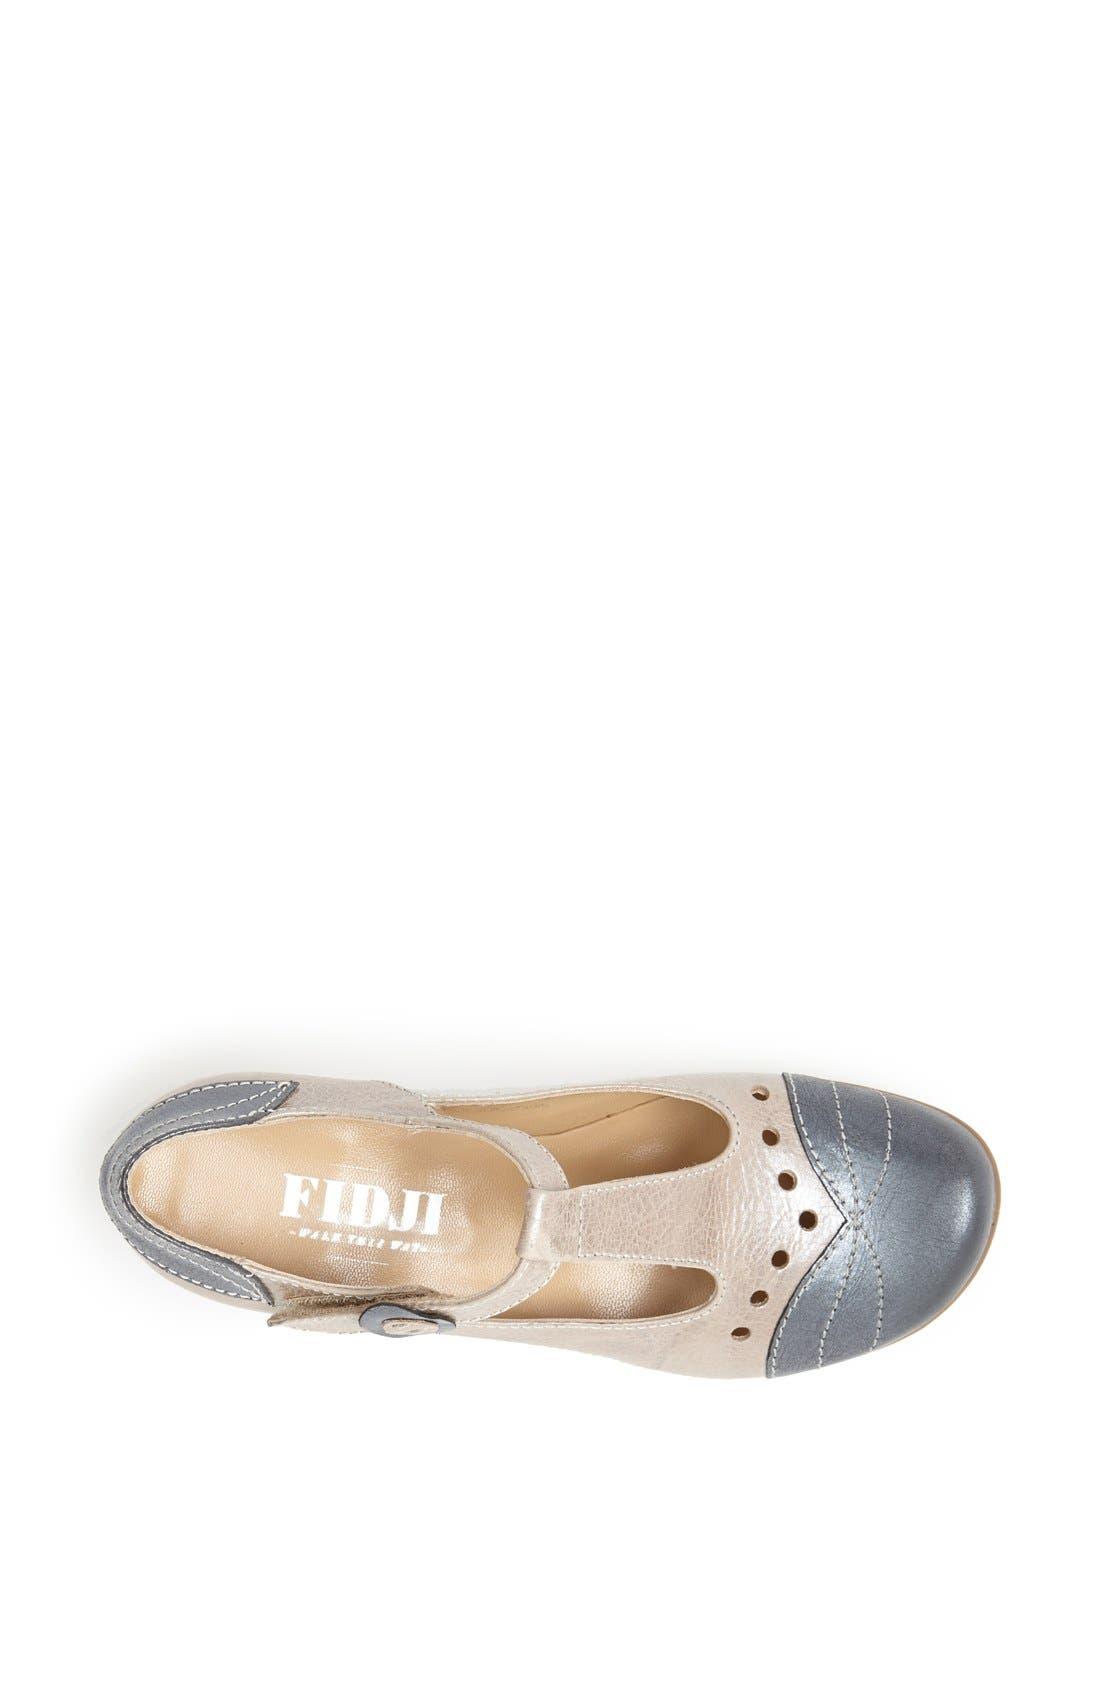 Alternate Image 3  - Fidji Metallic Leather Mary Jane